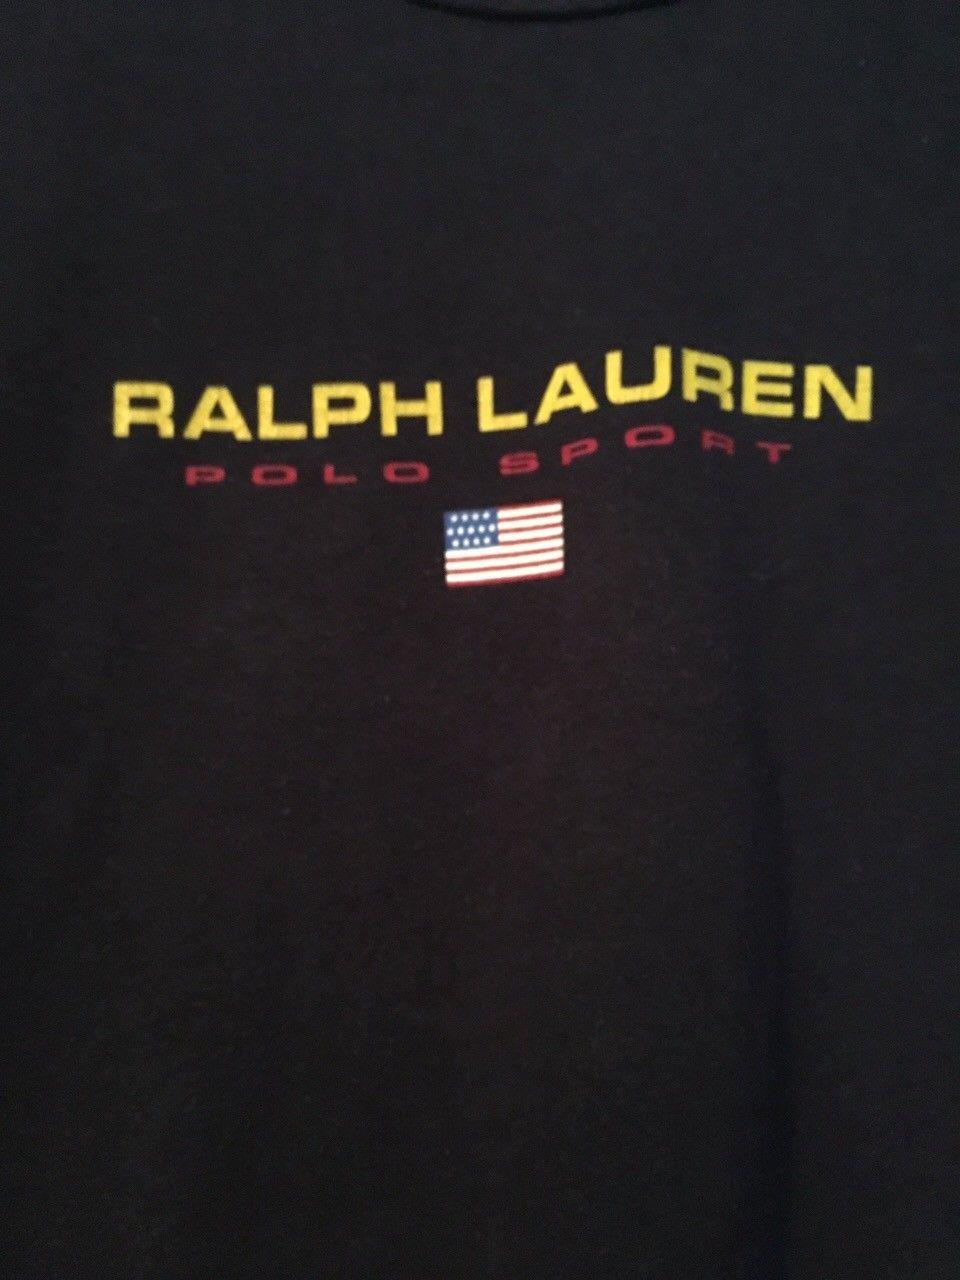 Polo sport t-skjorte - Oslo  - Polo Sport t-skjorte i marineblå/ navy selges. Passer en XS/S.   Supreme, palace, gosha polo by Ralph Lauren  250,- - Oslo